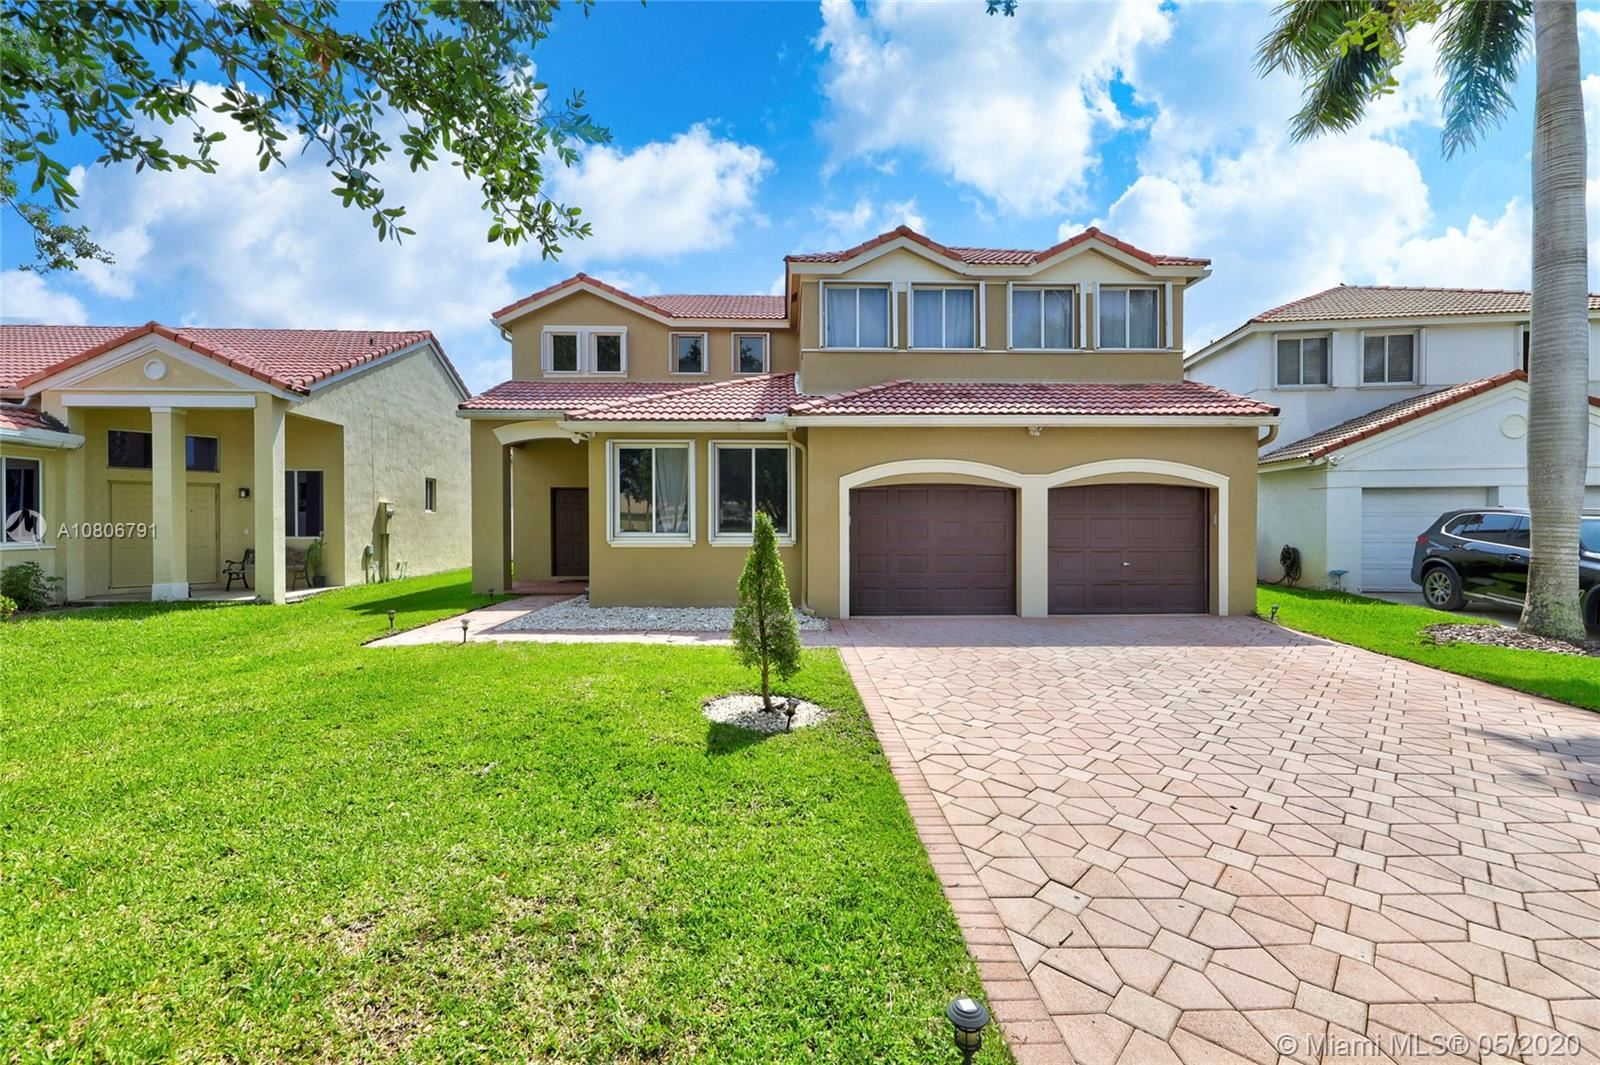 1302 Camellia Lane, Weston, FL 33326 - MLS#: A10806791